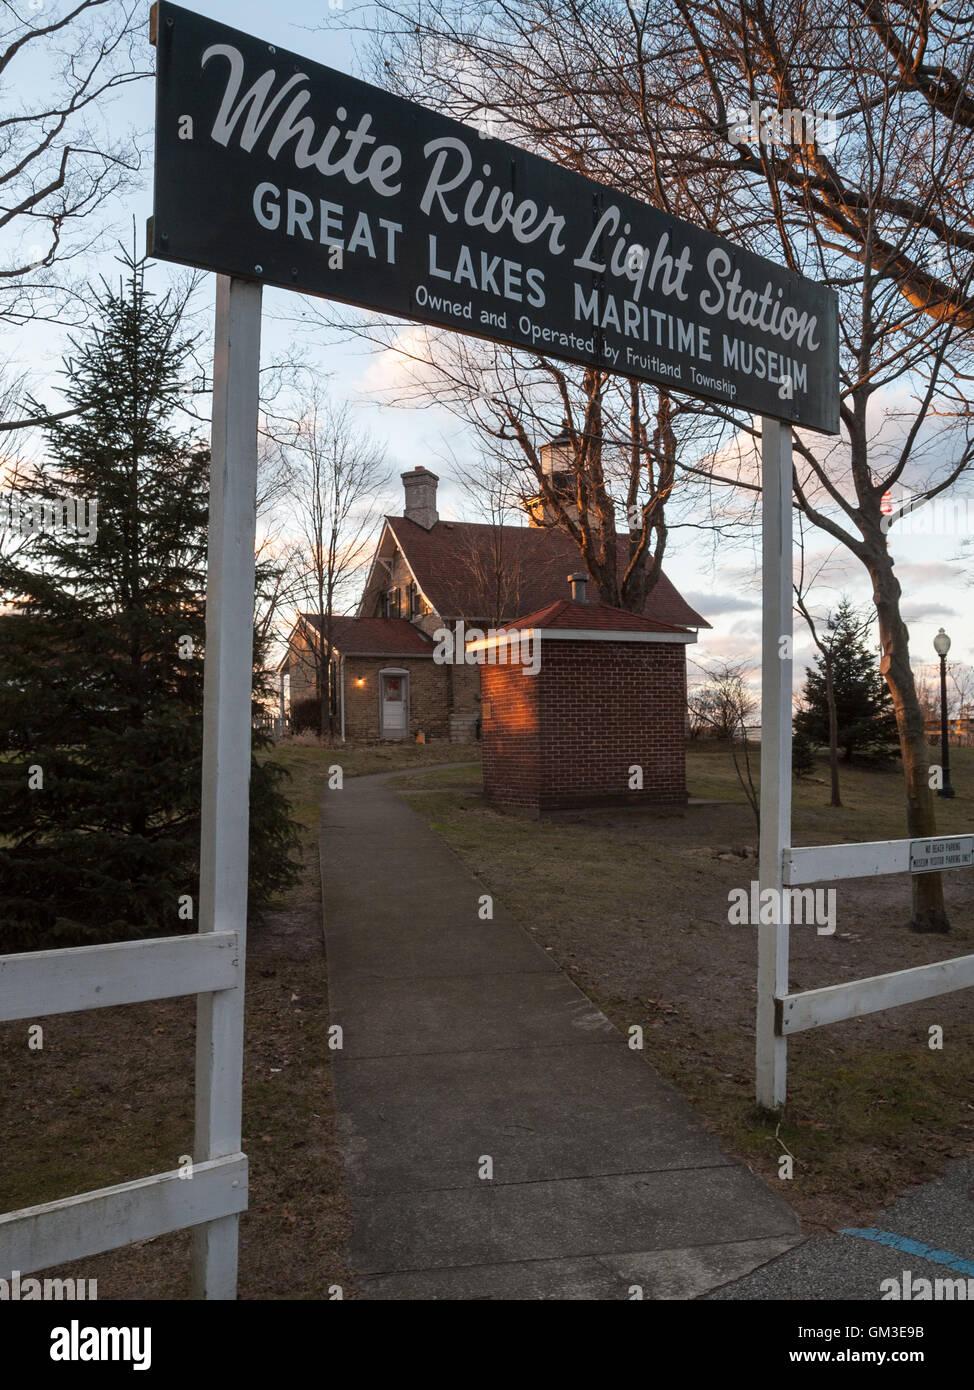 White River Channel and Lighthouse - Whitehall Michigan, Wabiningo , Sylvan Beach, Montague, Lake Michigan, Muskegon - Stock Image